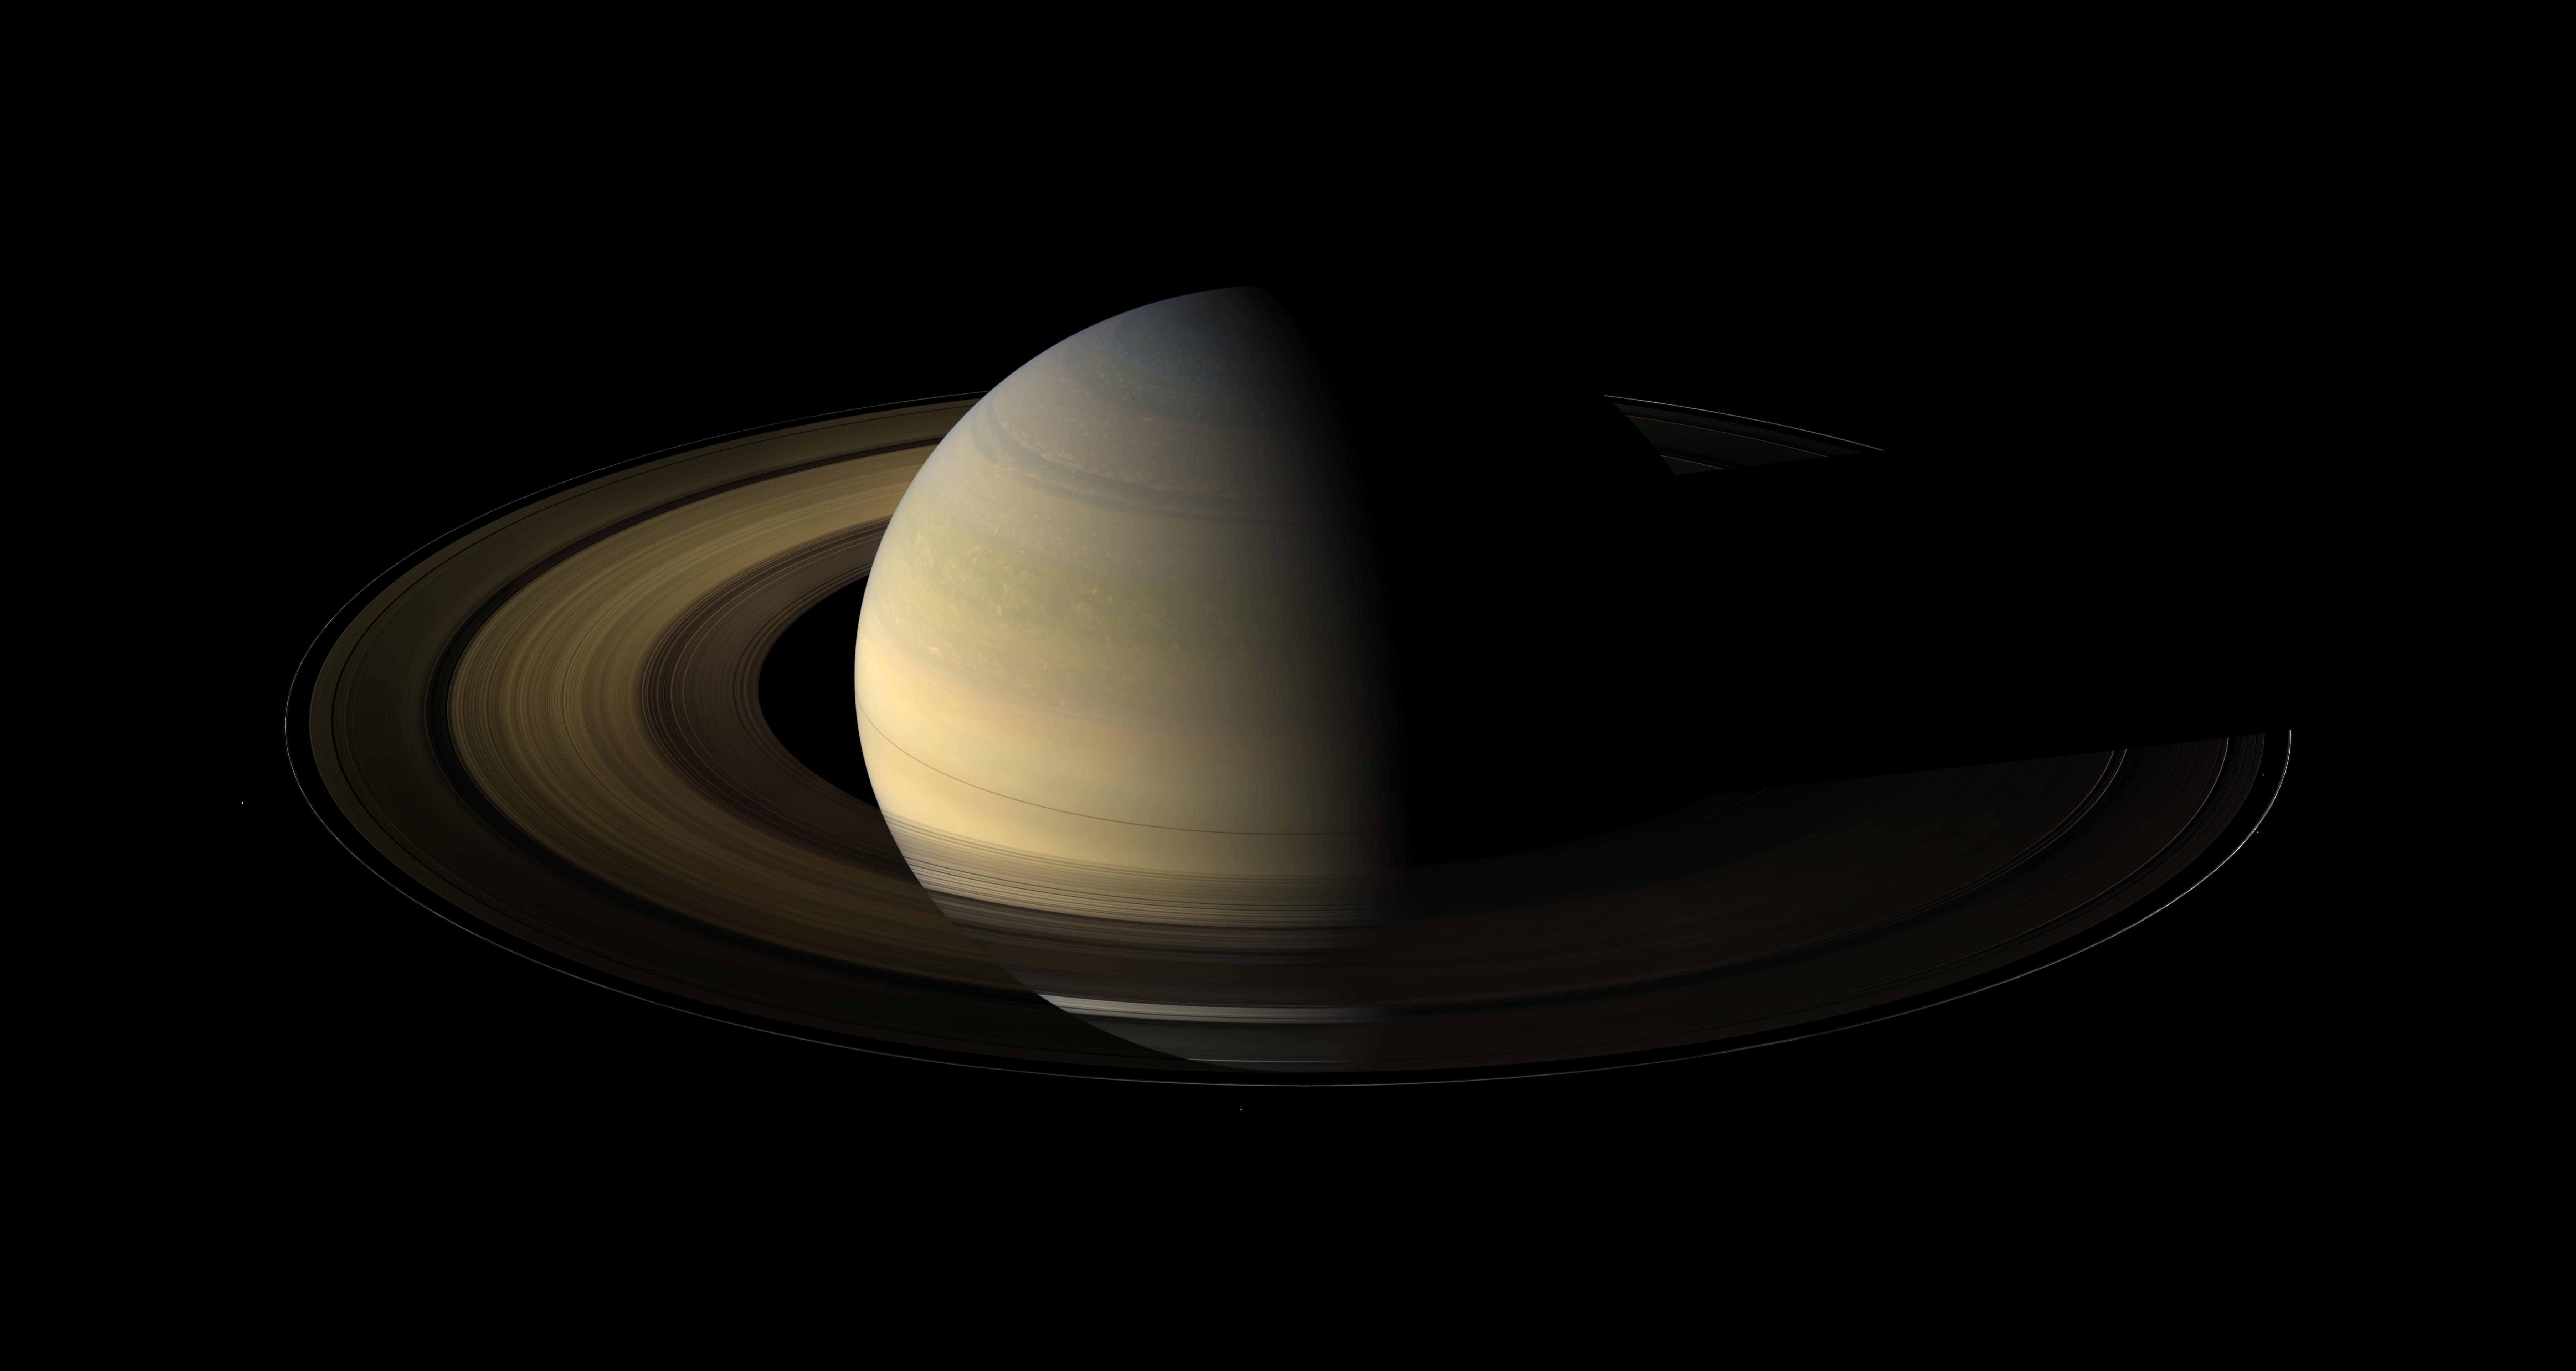 Saturn's Spring